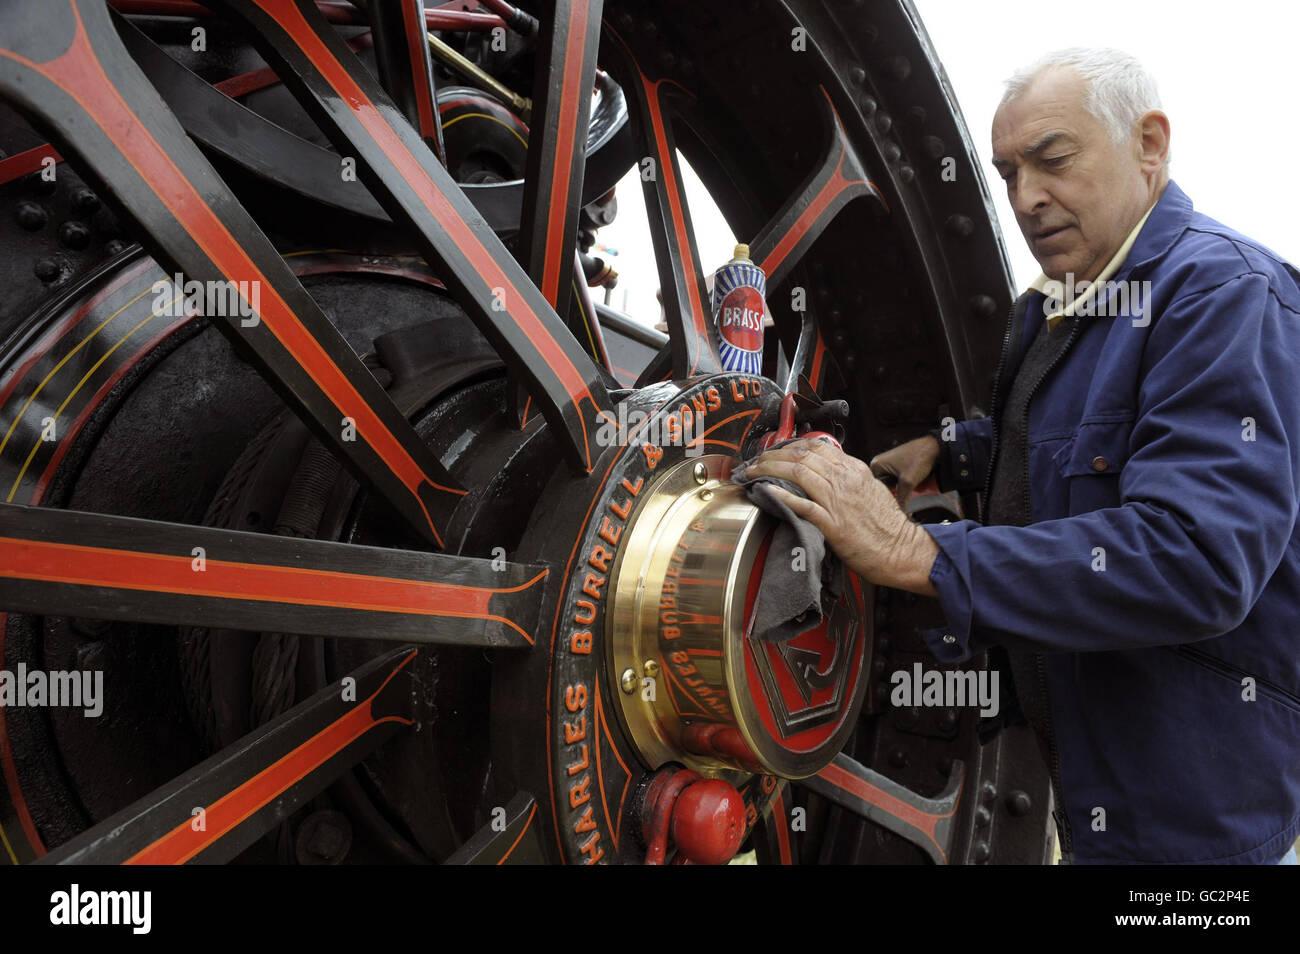 Barleylands Steam Fair - Stock Image